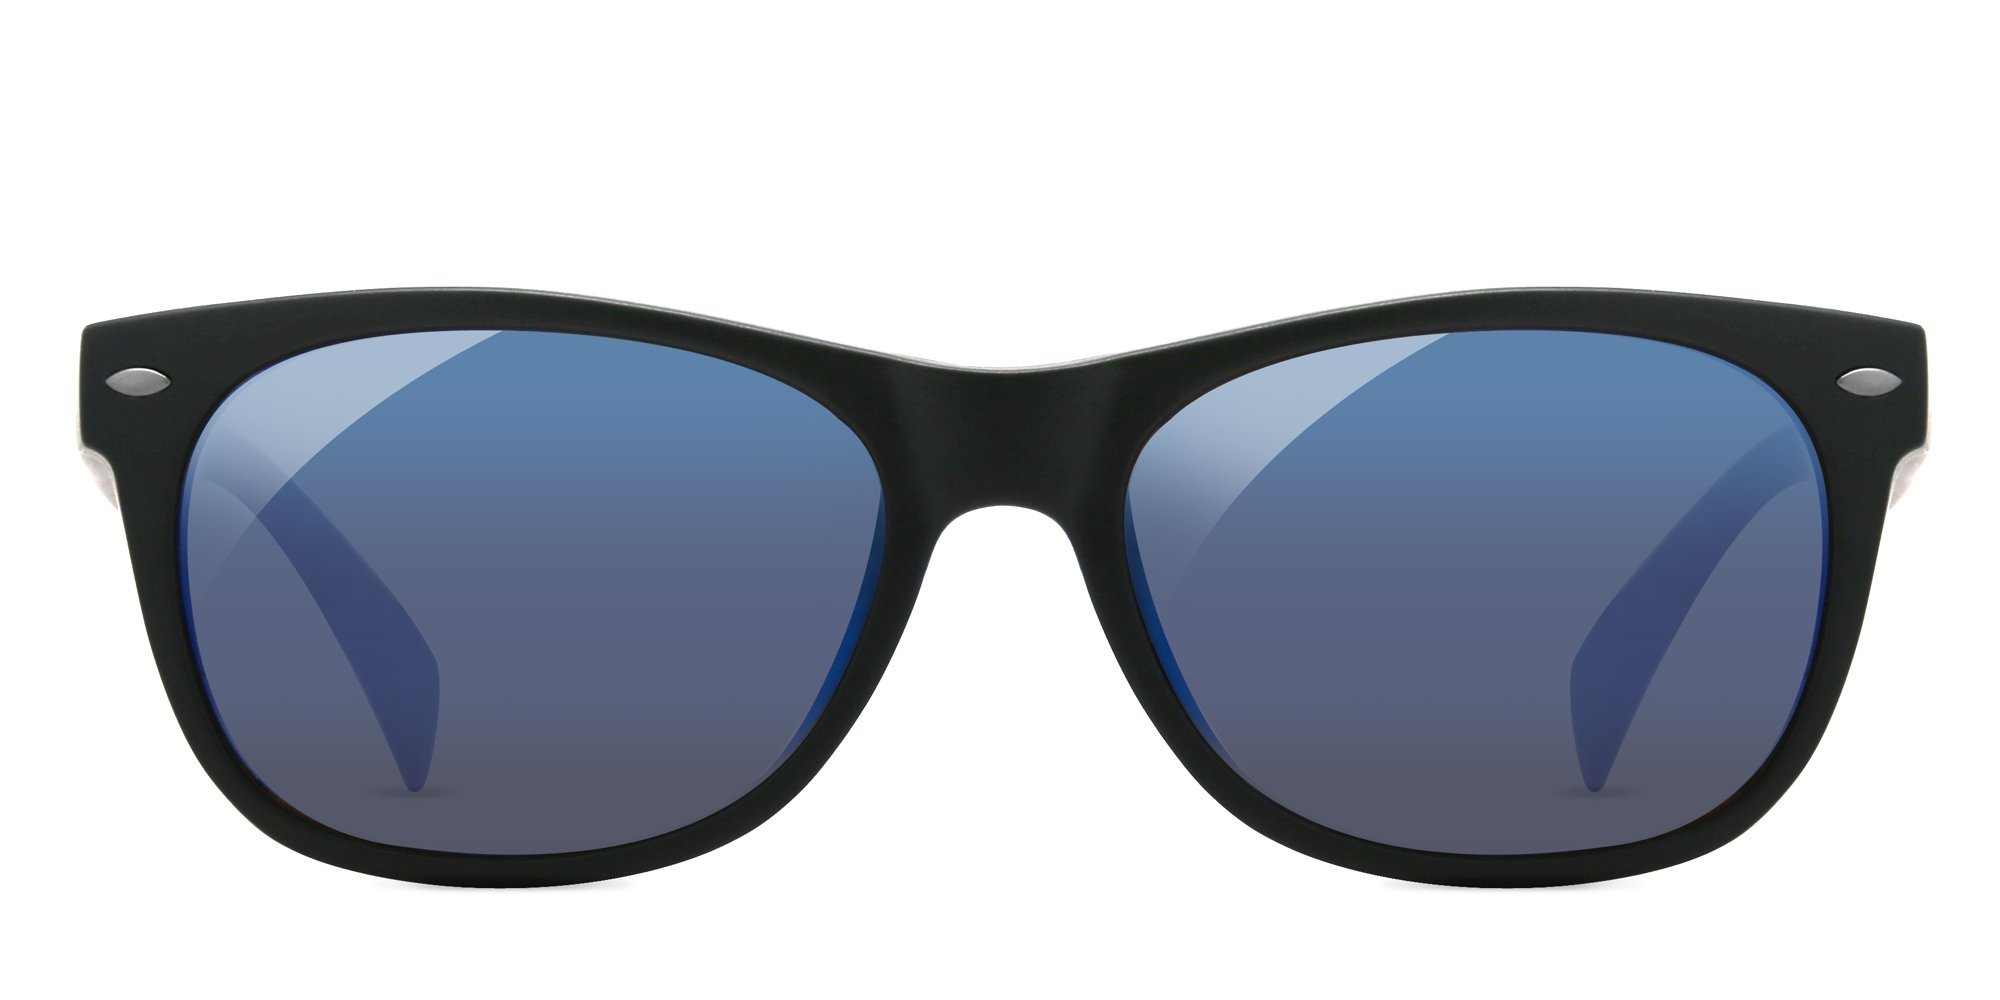 Enchroma Ellis - Color Blind Glasses (Black, Enchroma sunglass with blue anti-reflective coating) by Enchroma